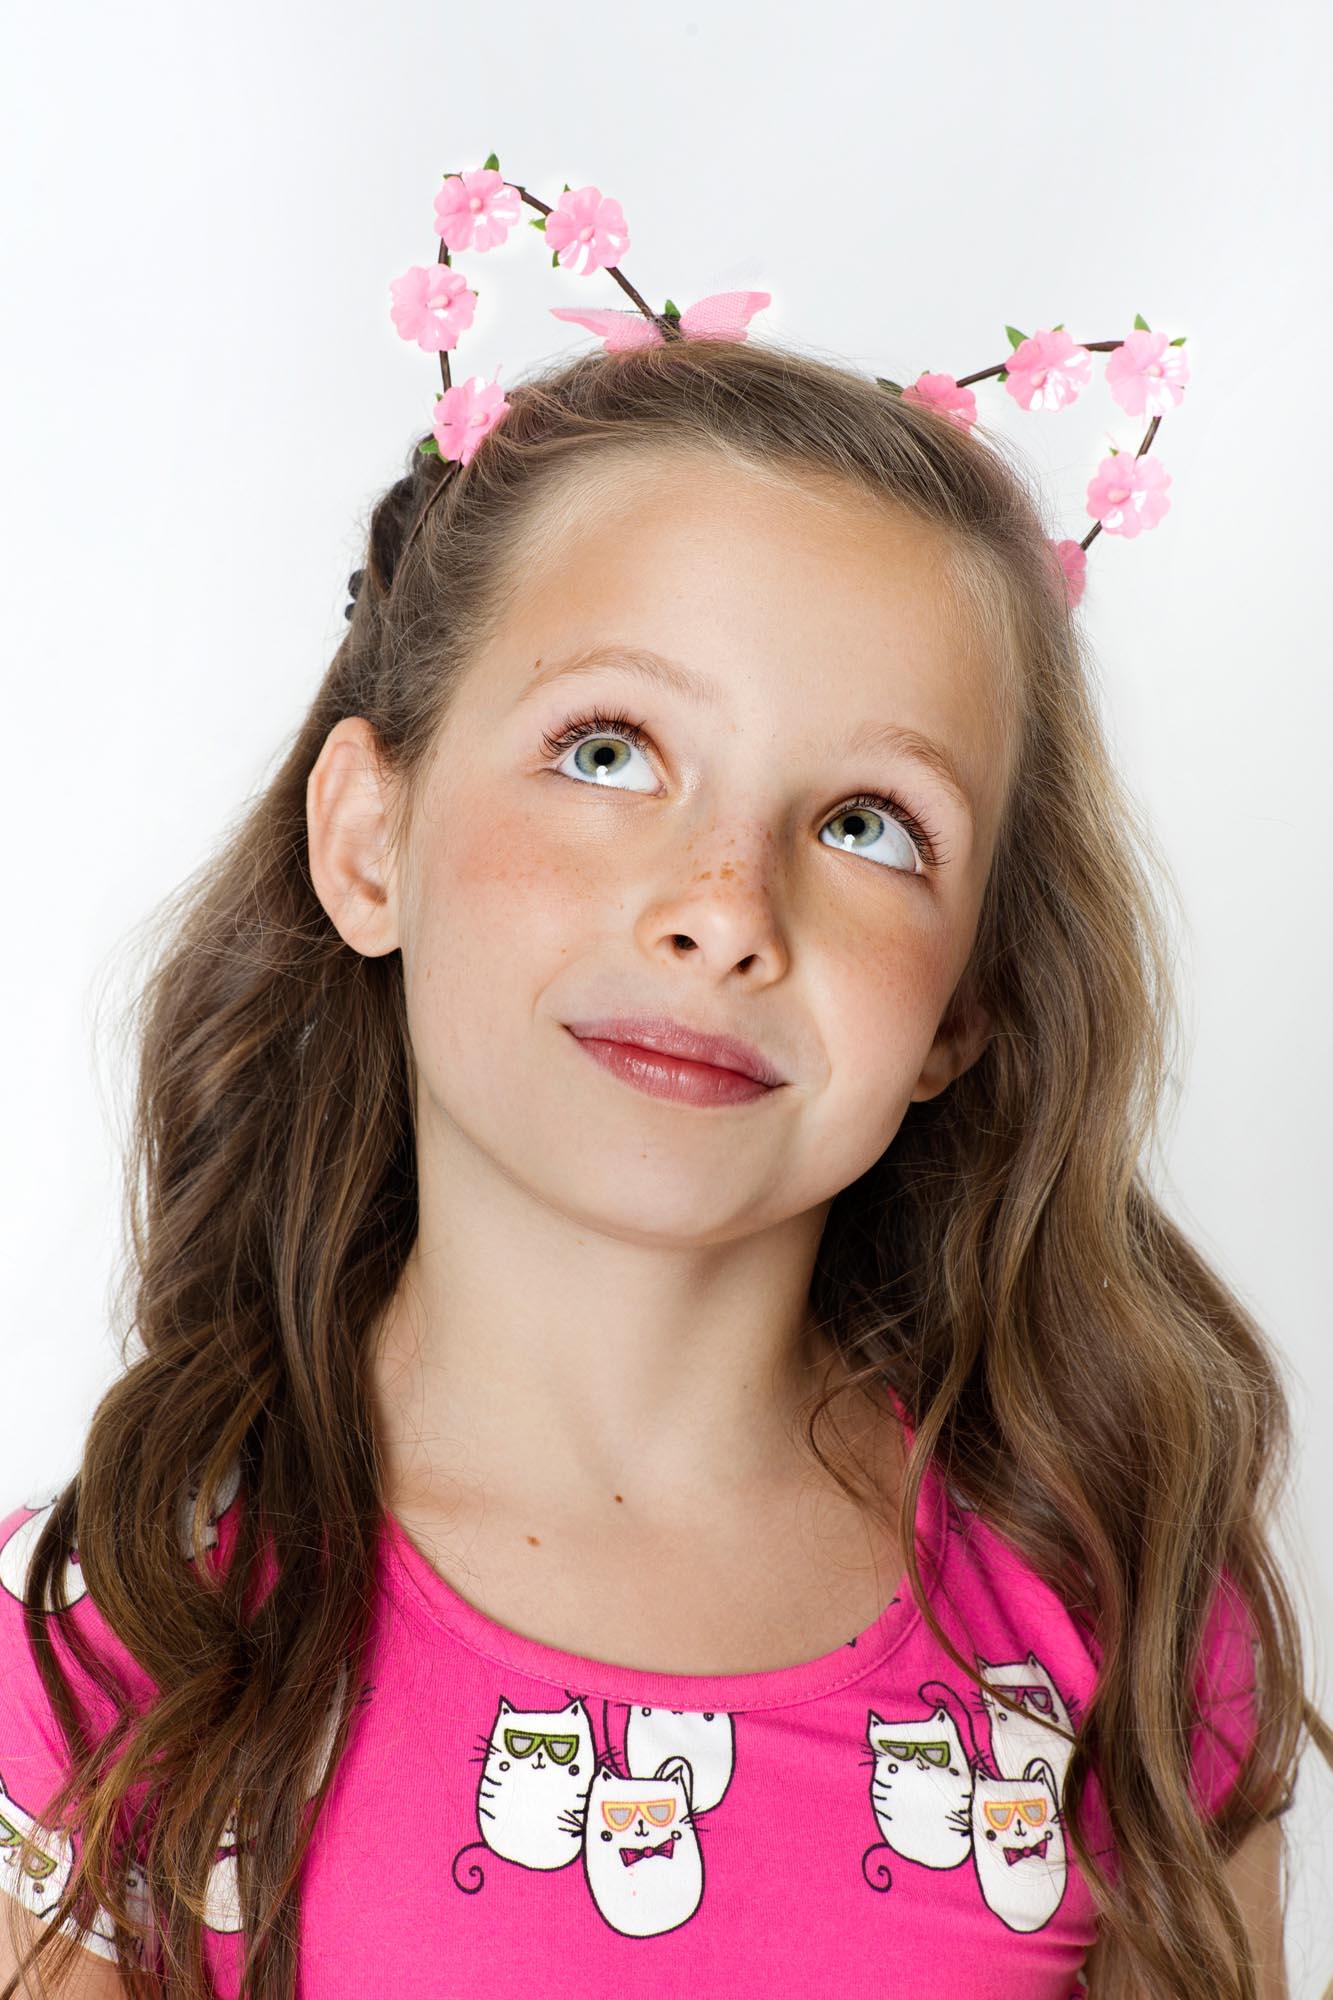 nyc-photographers-kids-modeling-10003.jpg